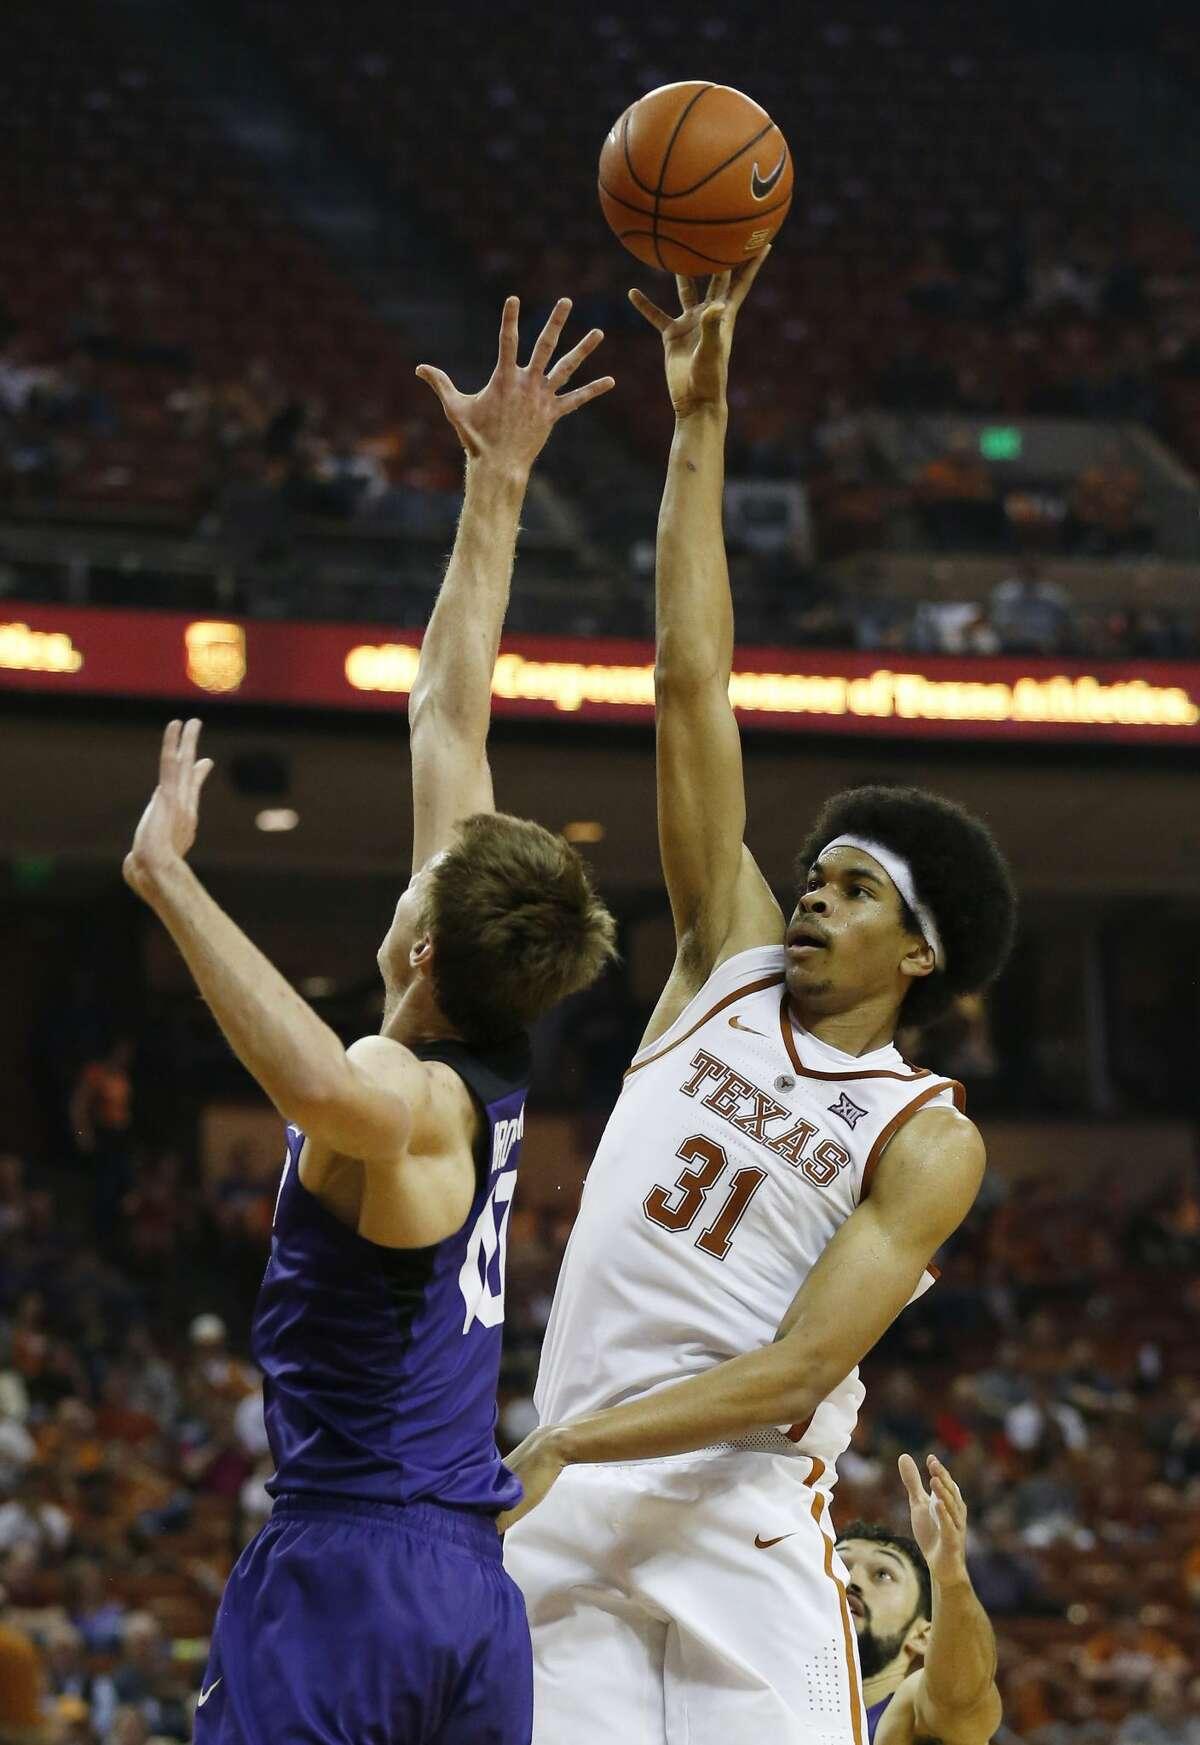 Texas' Jarrett Allen (31) shoots over TCU's Vladimir Brodziansky (10) during their game at the Frank Irwin Center in Austin on Wednesday, Jan. 11, 2017. TCU defeated Texas, 64-61.(Kin Man Hui/San Antonio Express-News)